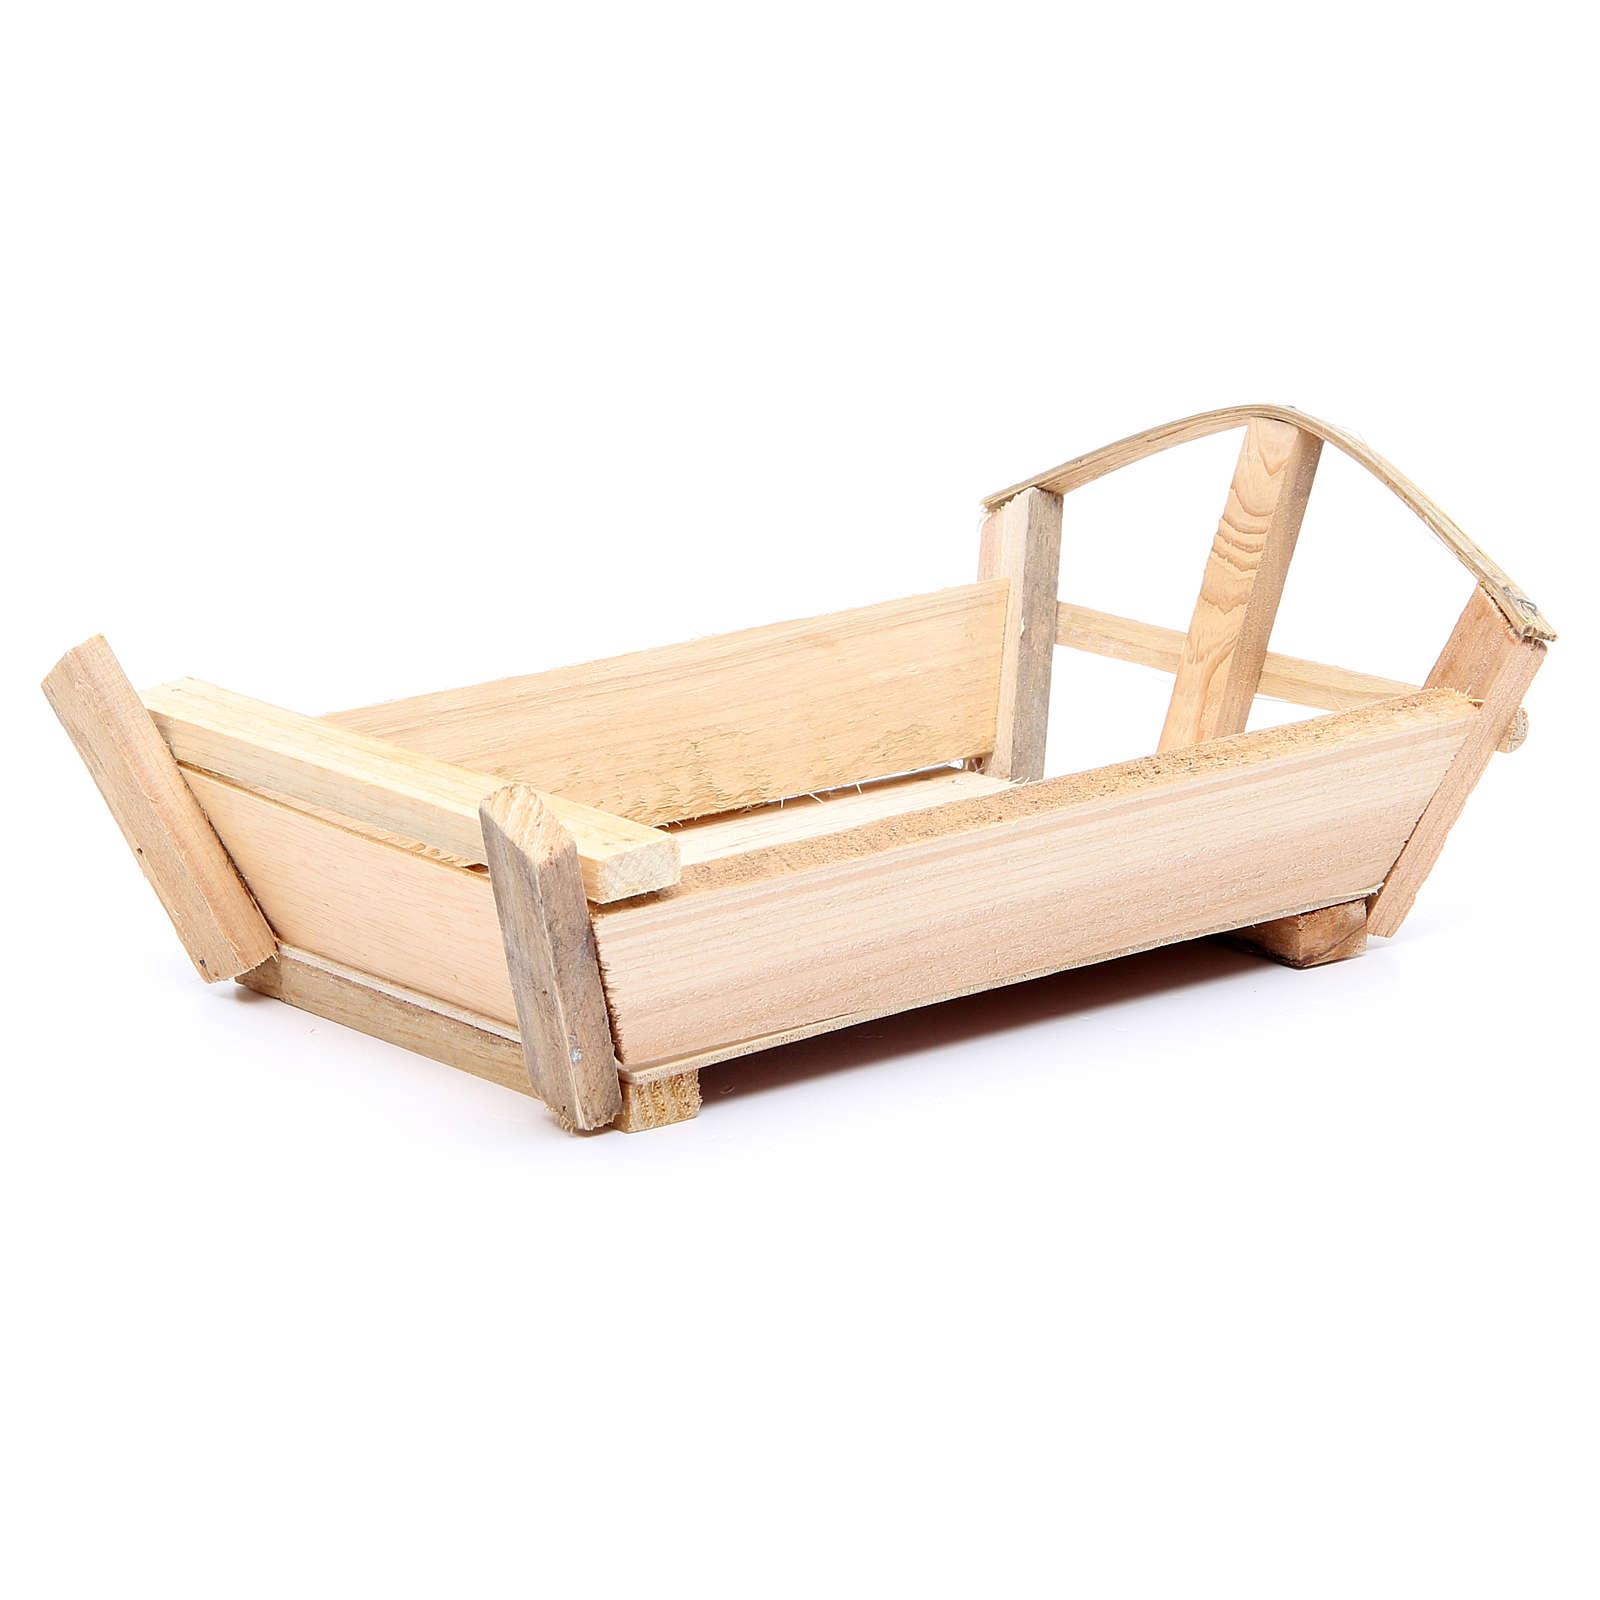 Cuna de madera 10x22x13 cm para Niño Jesús 3